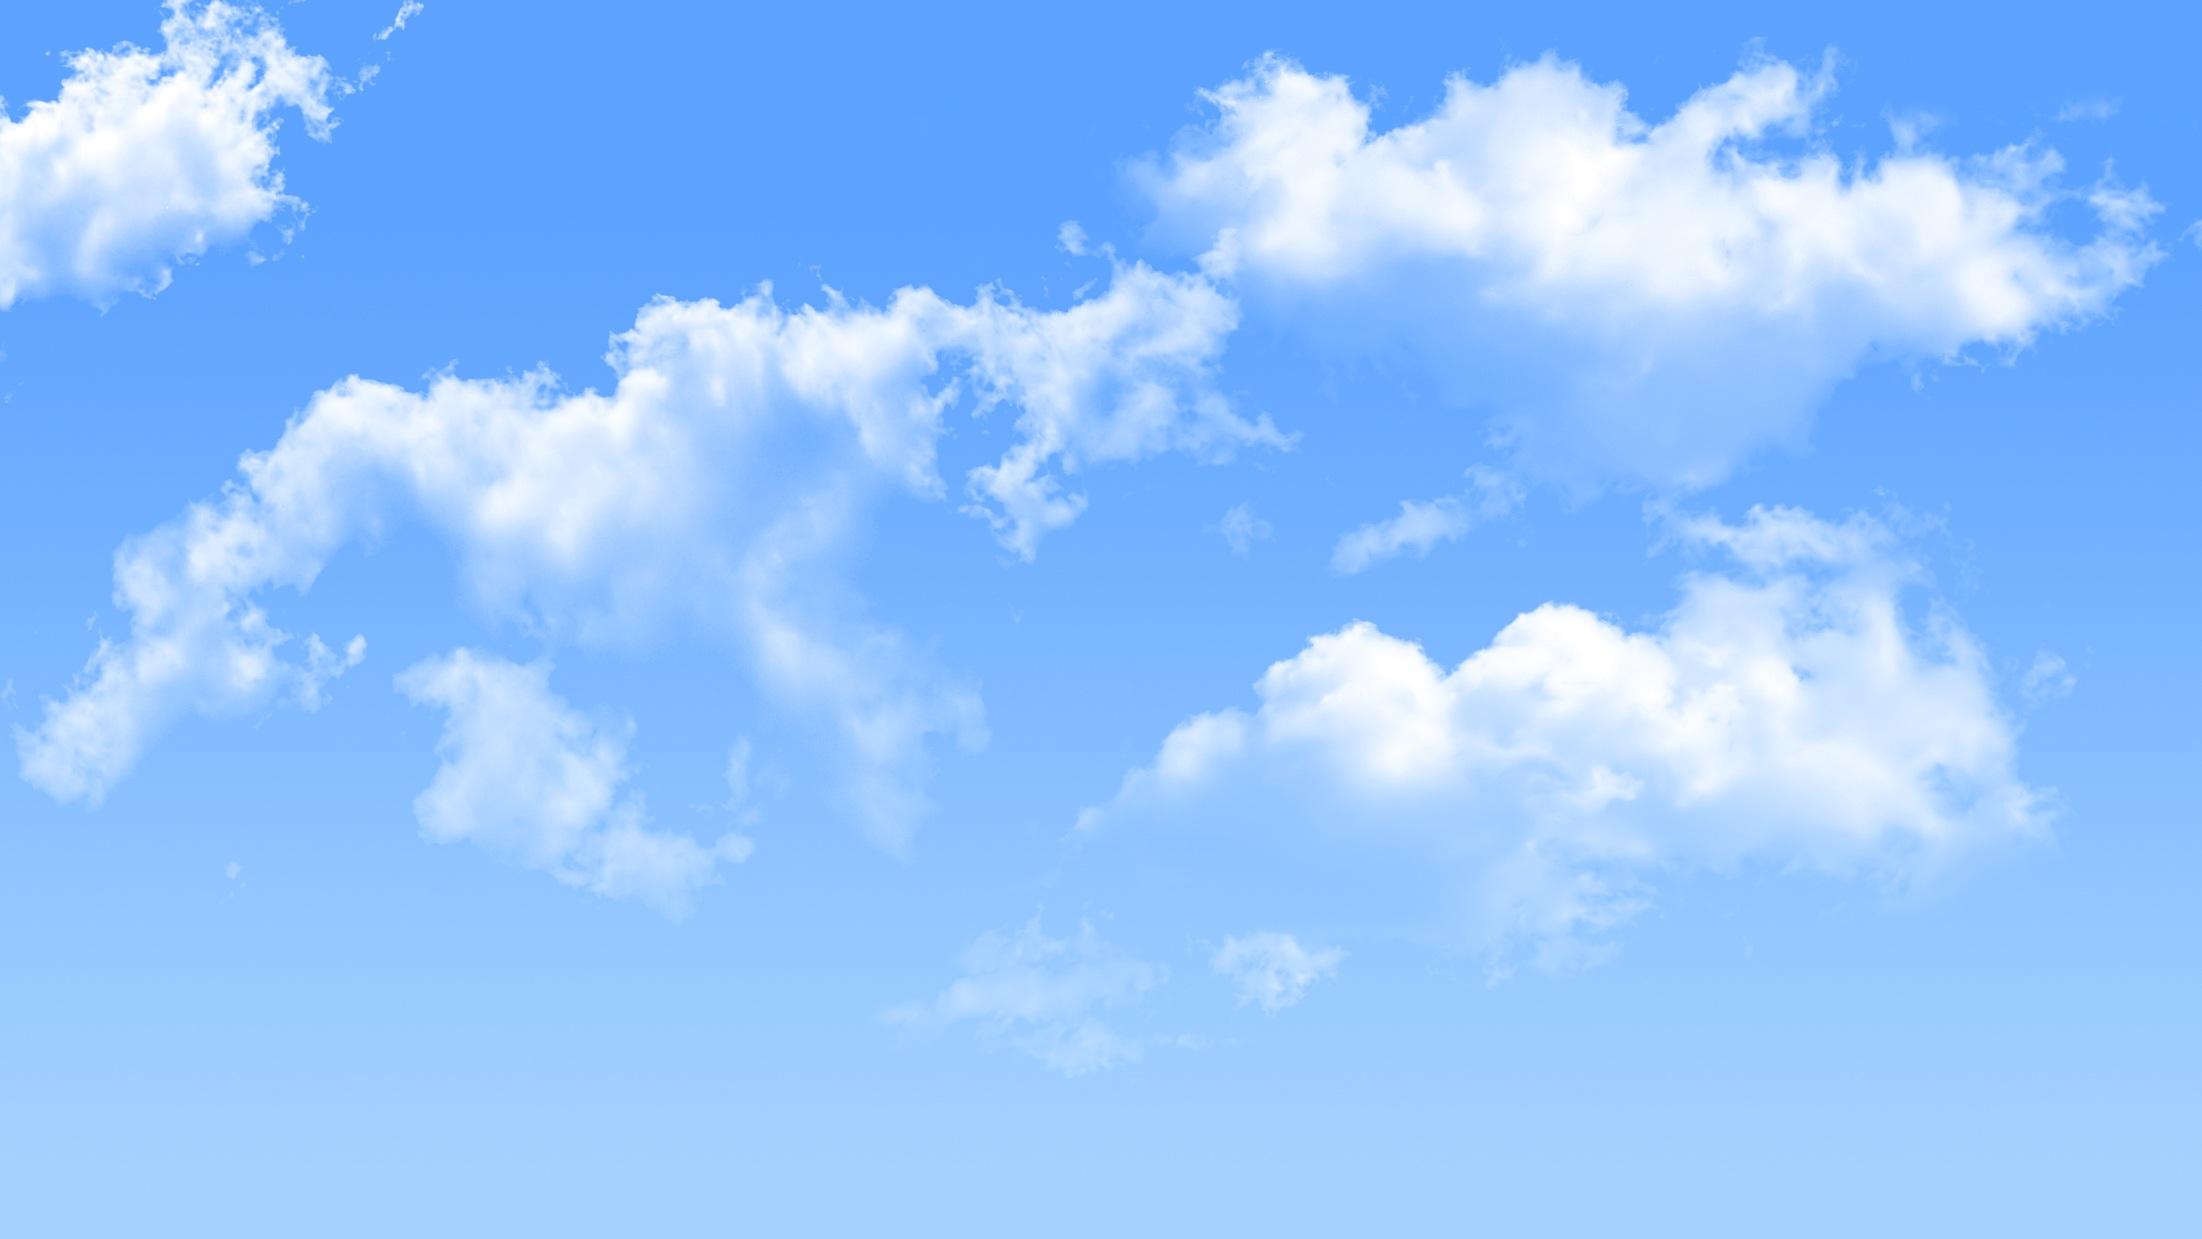 free images nature horizon light cloud sunlight cloudy air